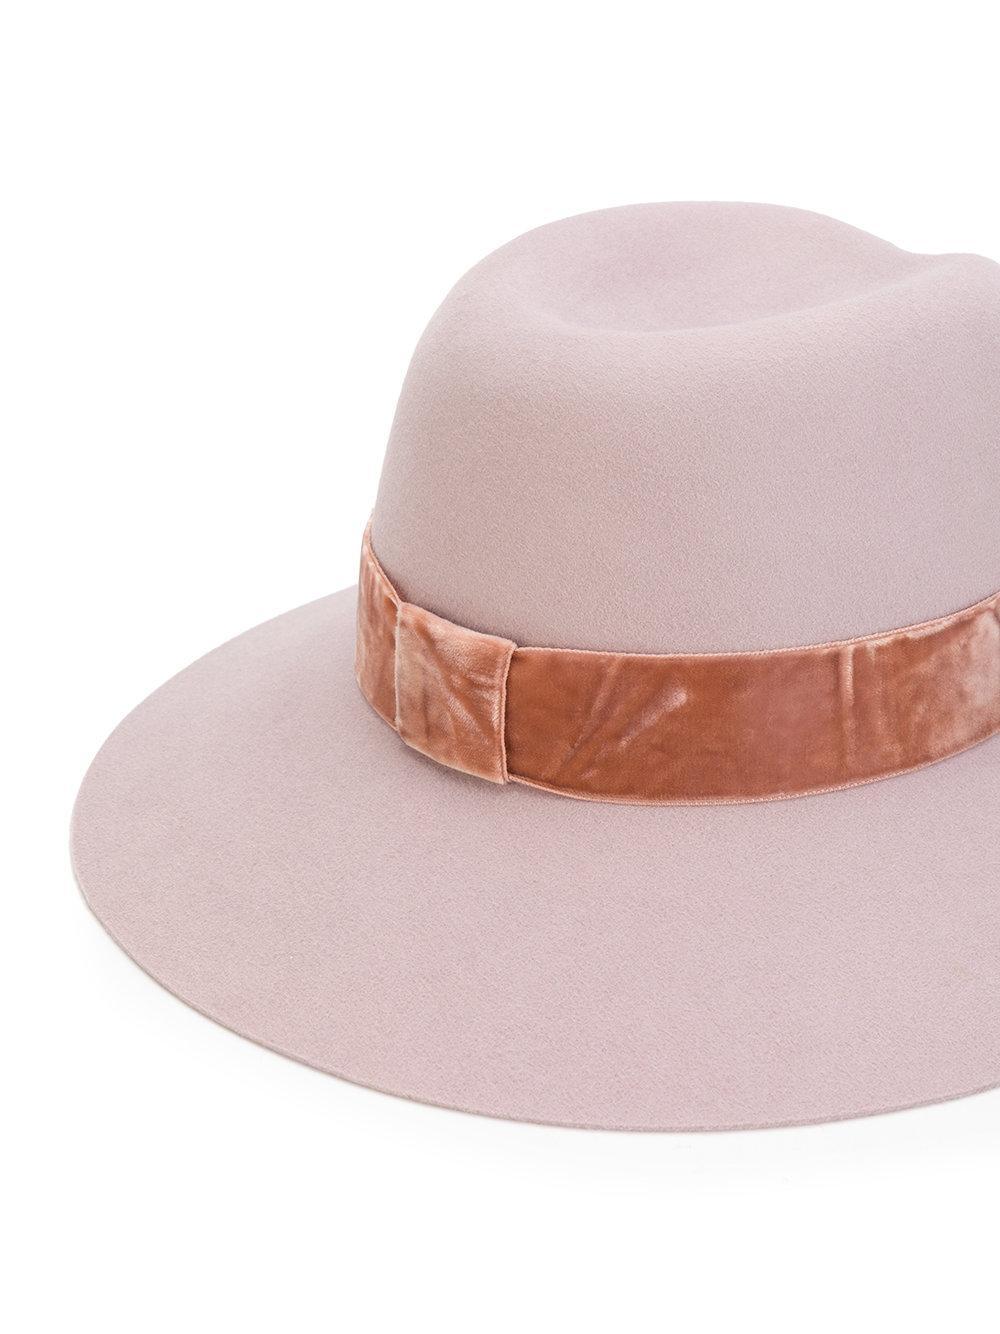 Lyst maison michel felt hat in pink for Maison michel